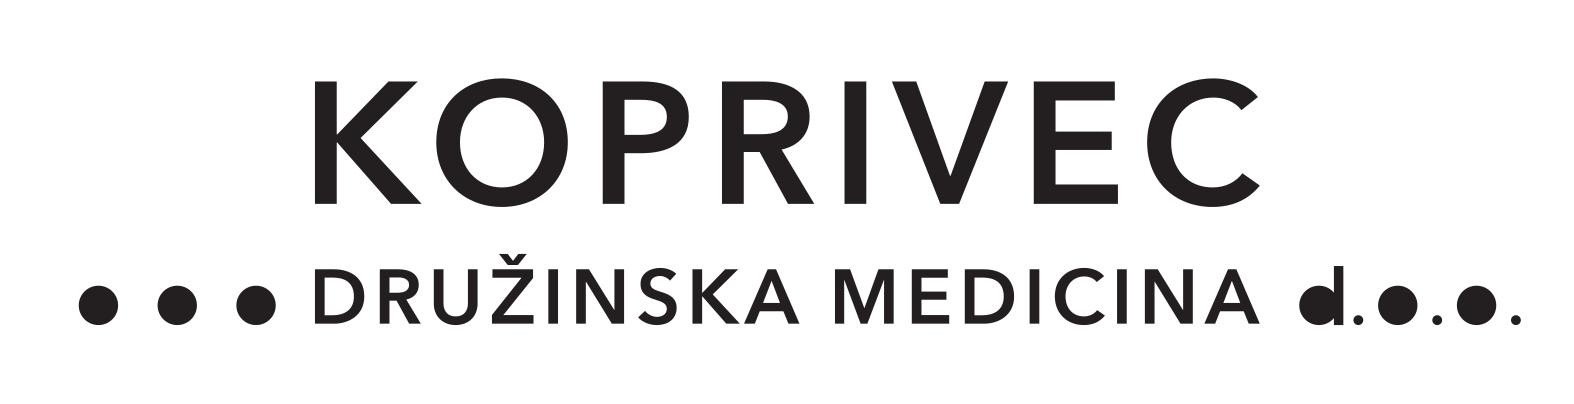 Koprivec družinska medicina logo